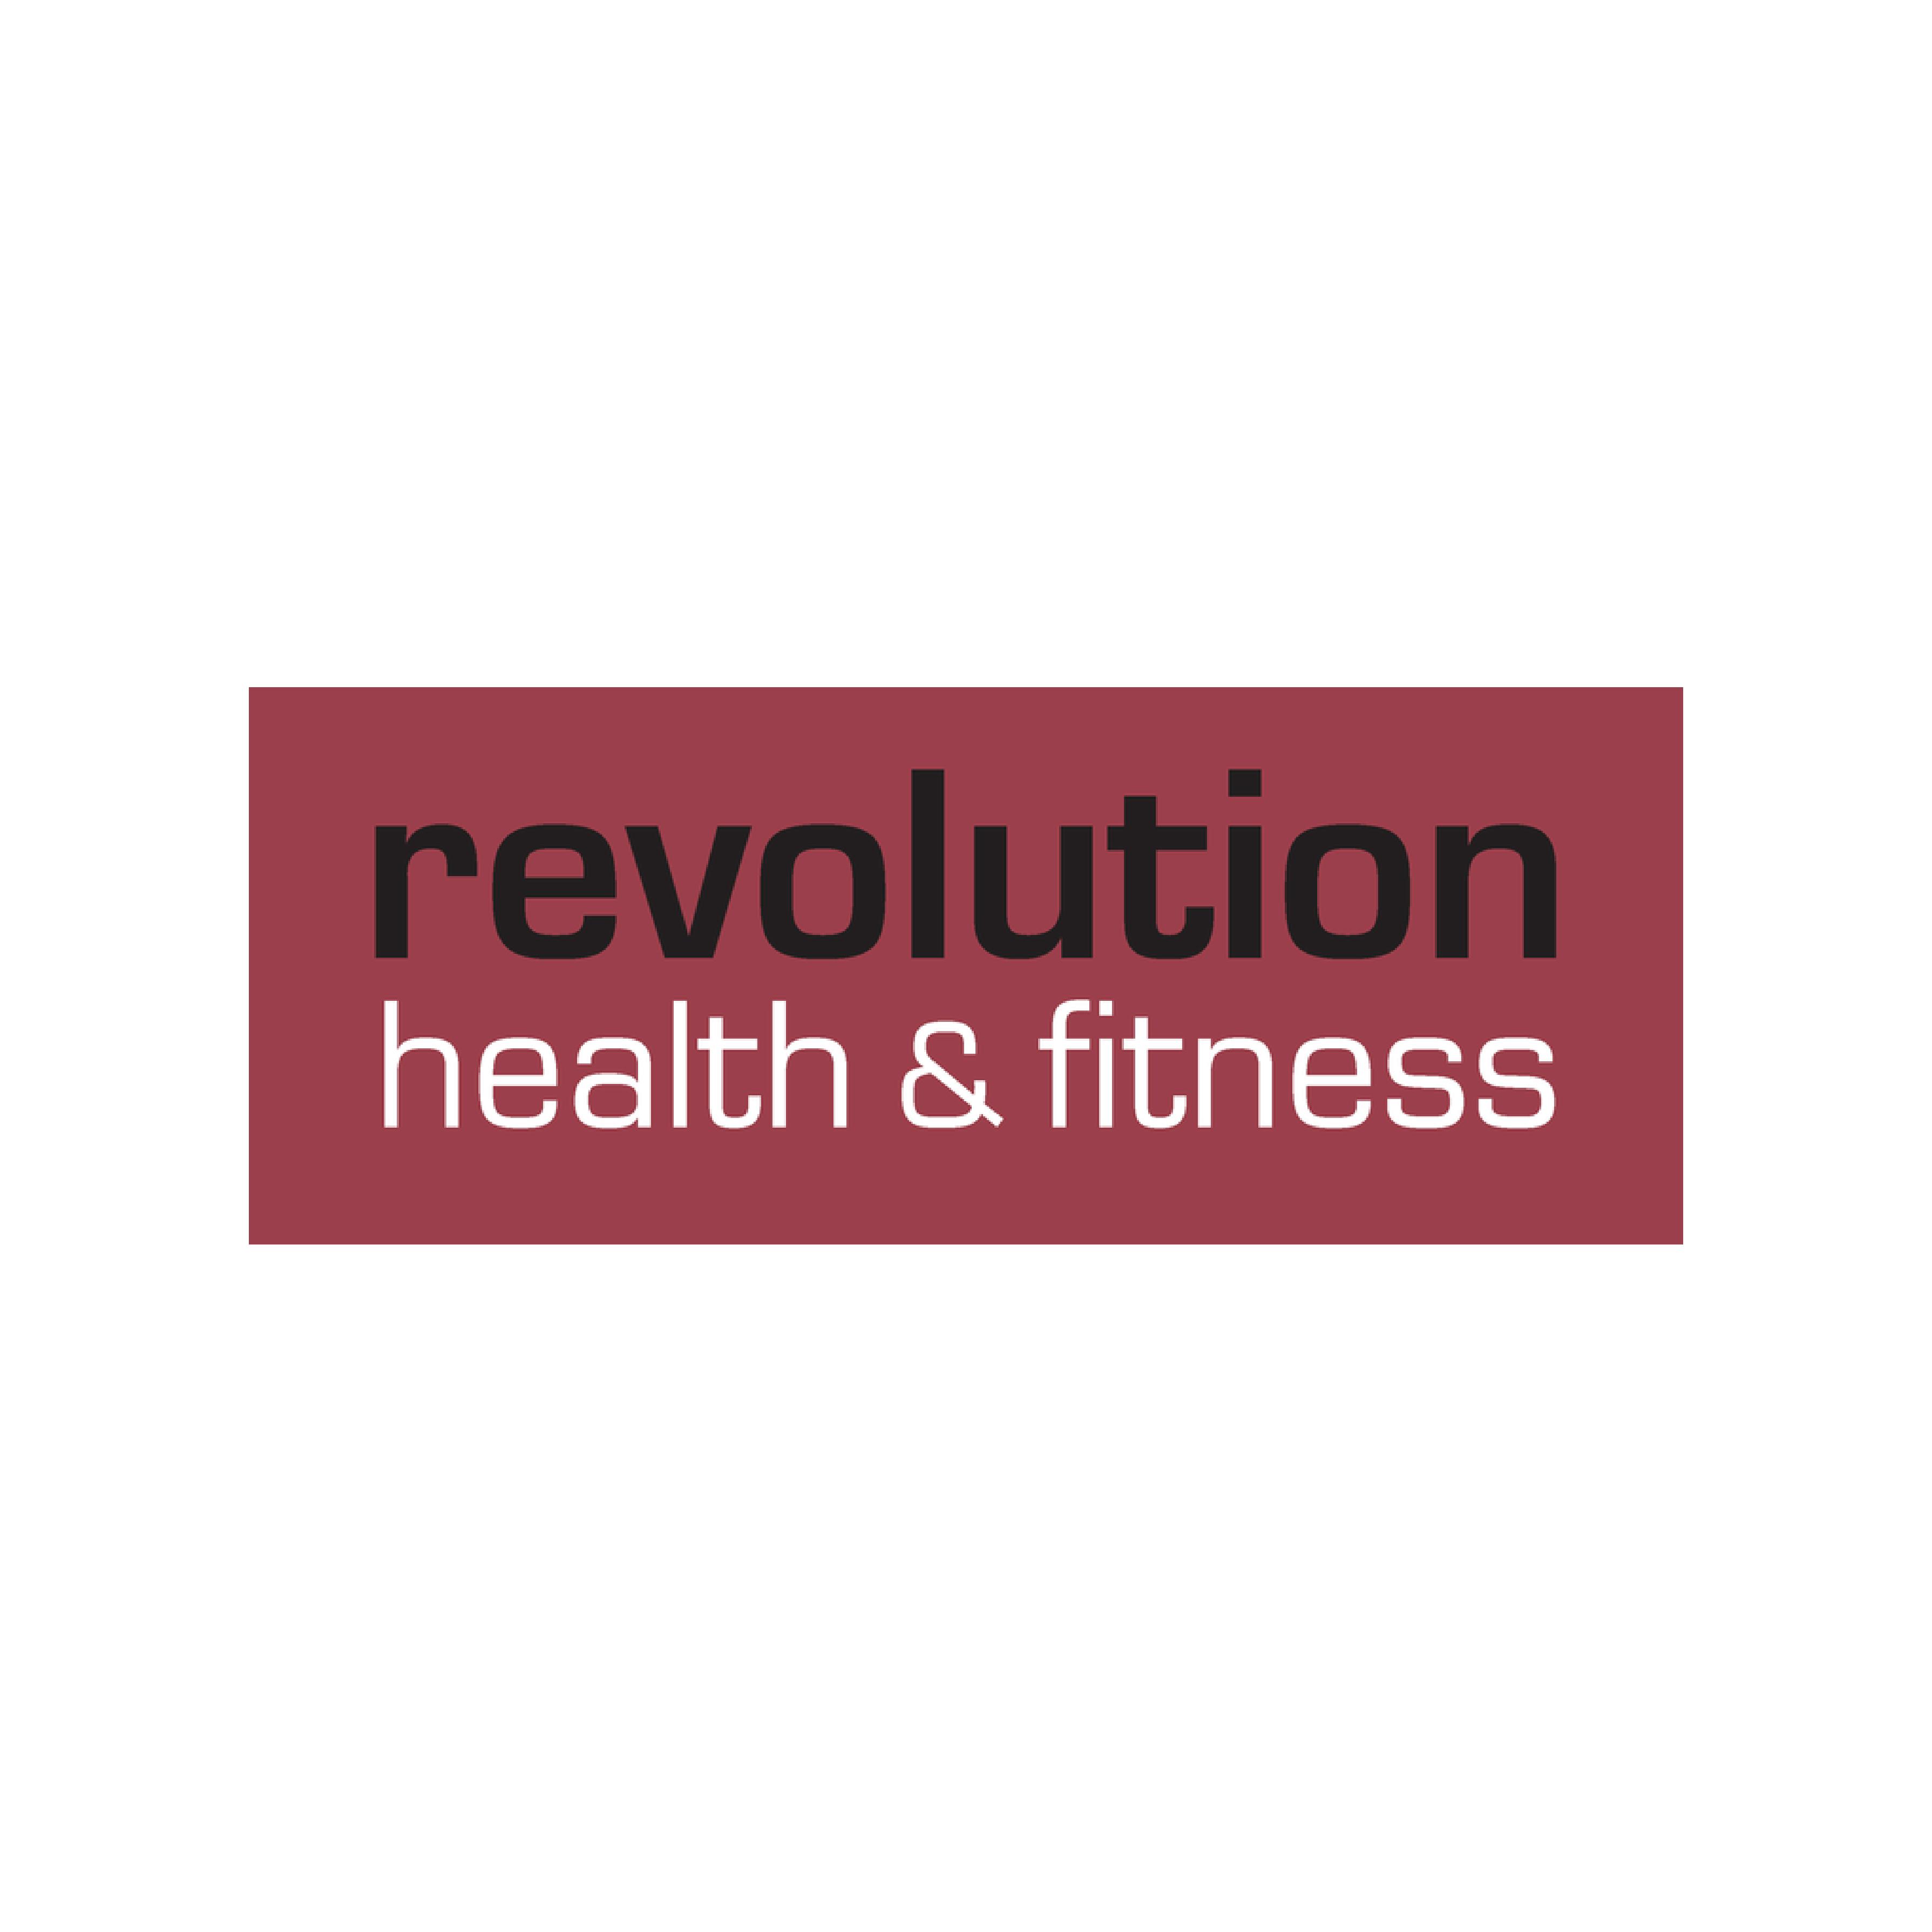 Revolution Health & Fitness